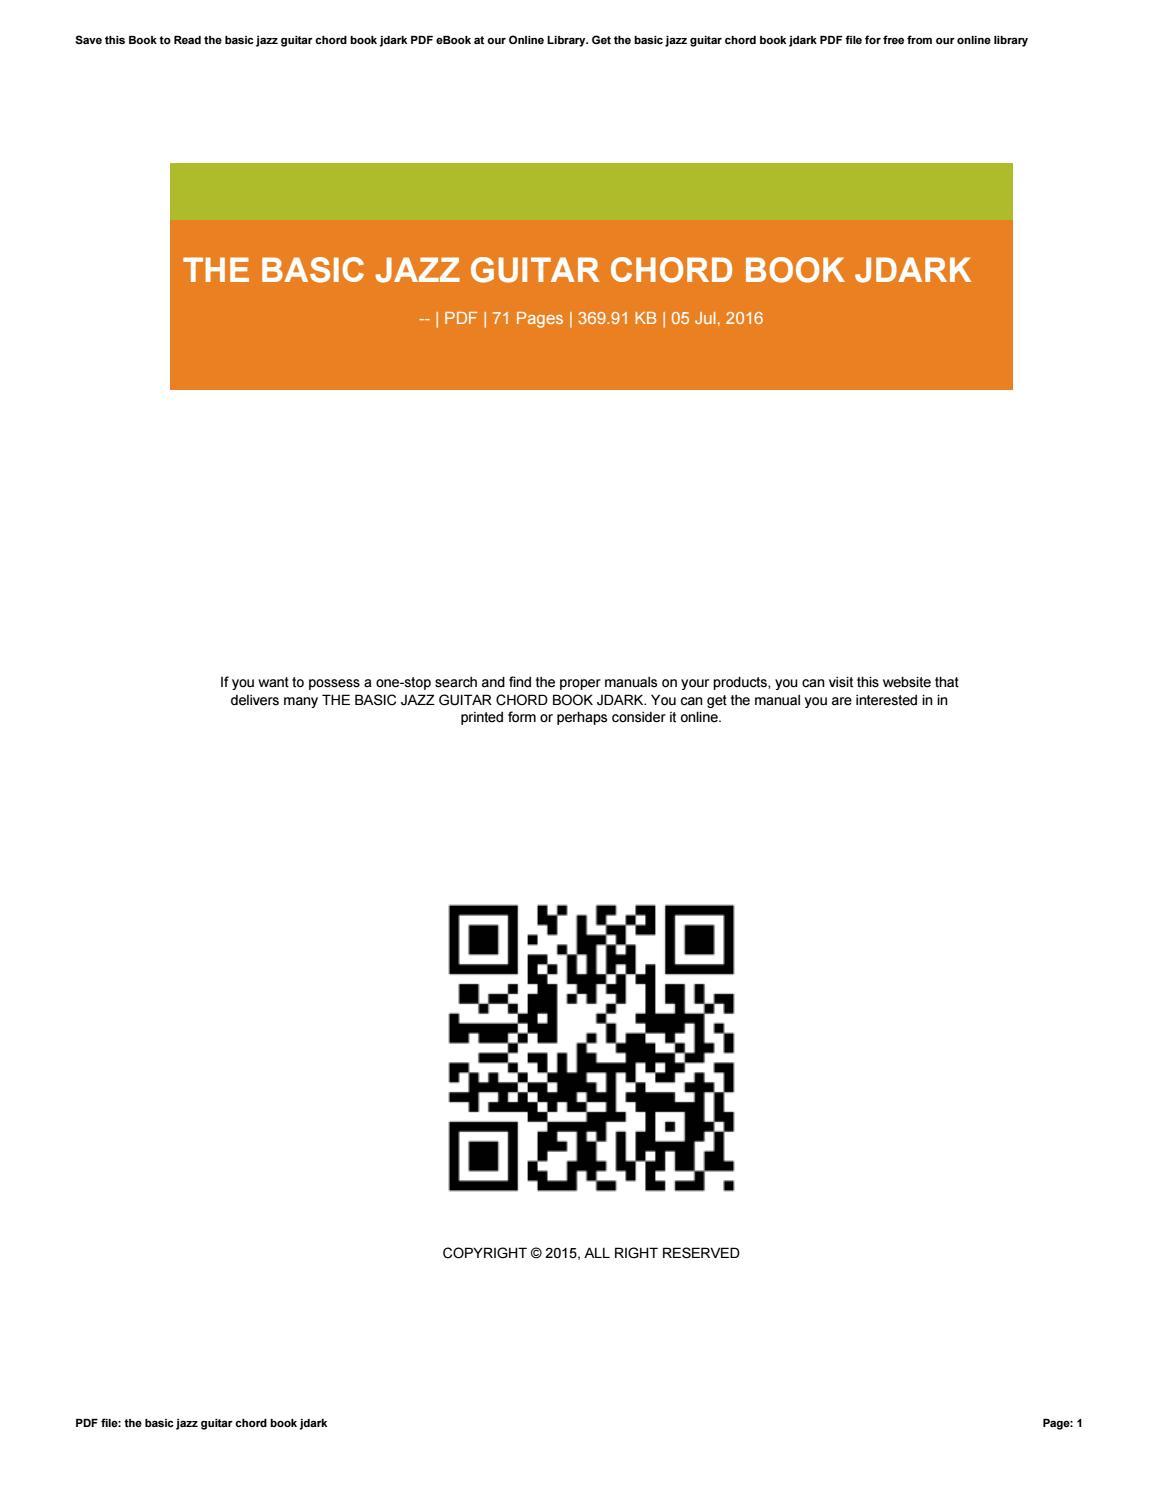 The Basic Jazz Guitar Chord Book Jdark By Rolas23telu Issuu